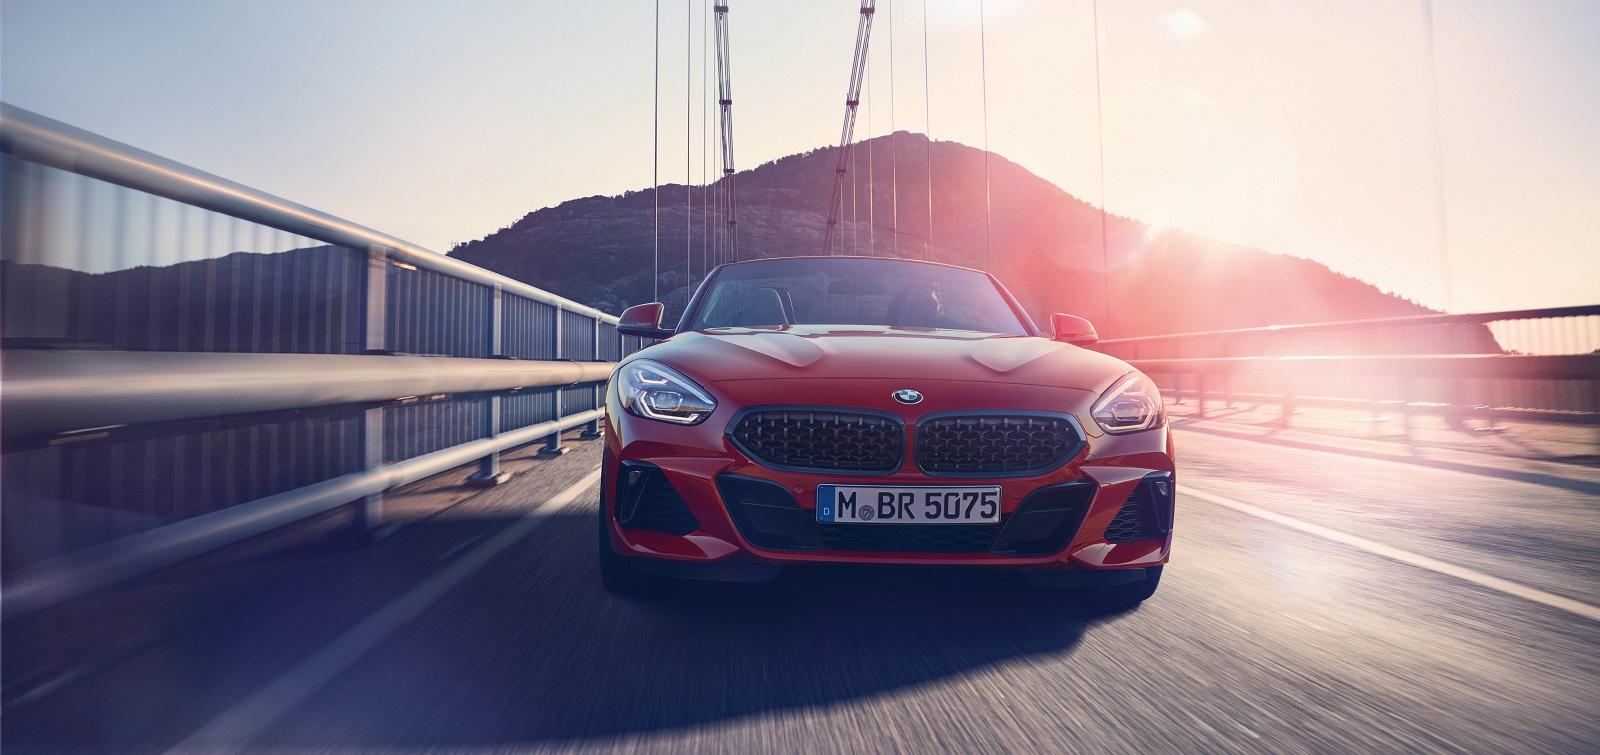 BMW Wagner - BMW Z4 Roadster Angebot